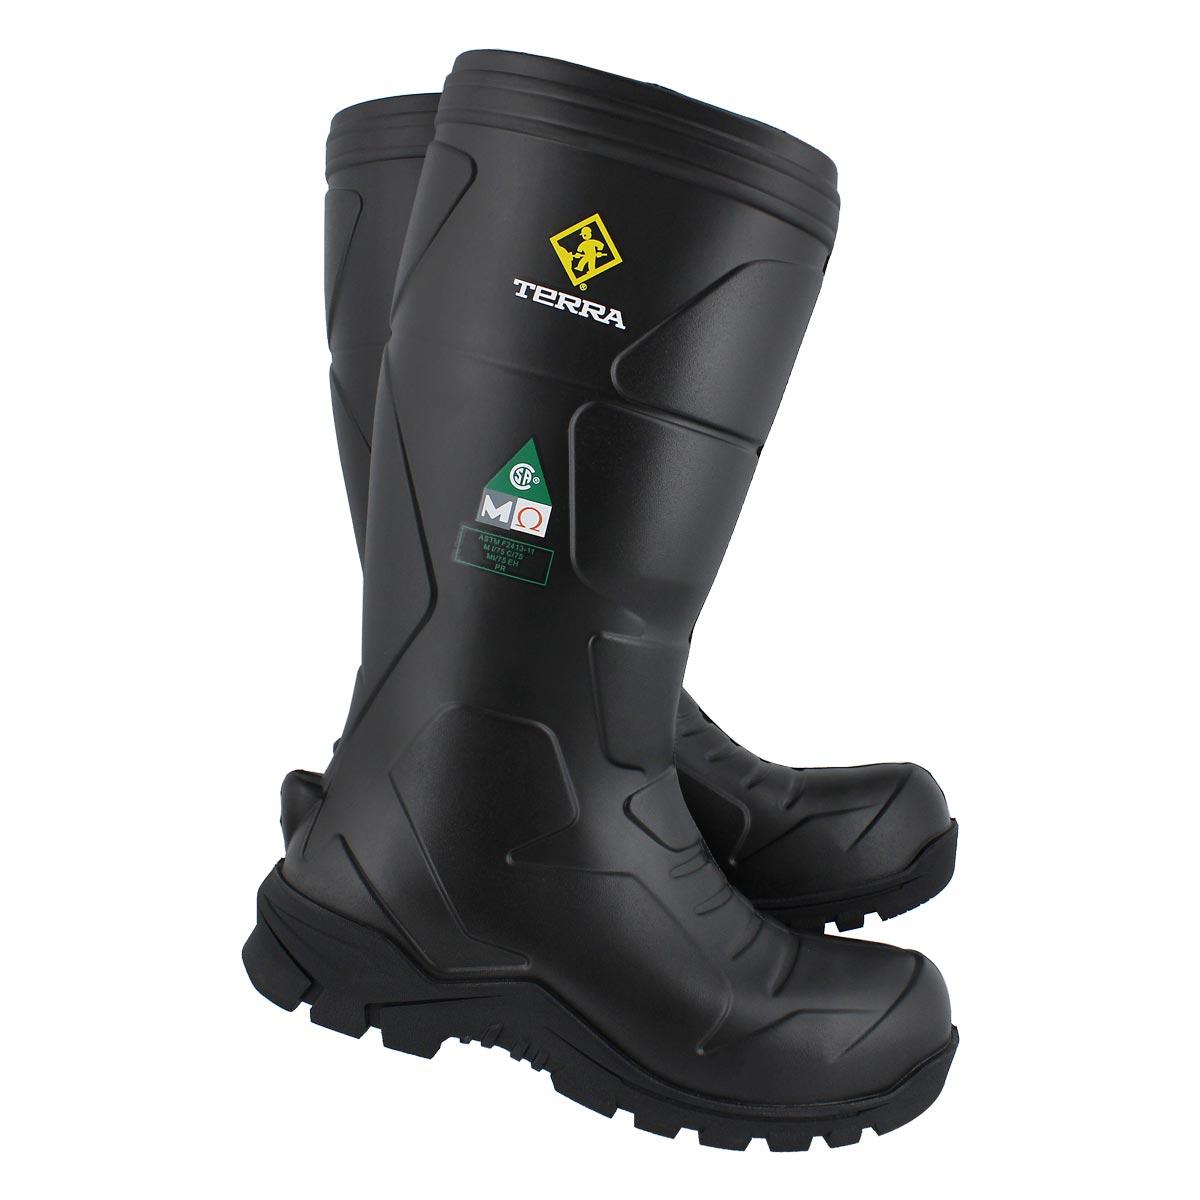 Mns Narvik black slip on CSA boot